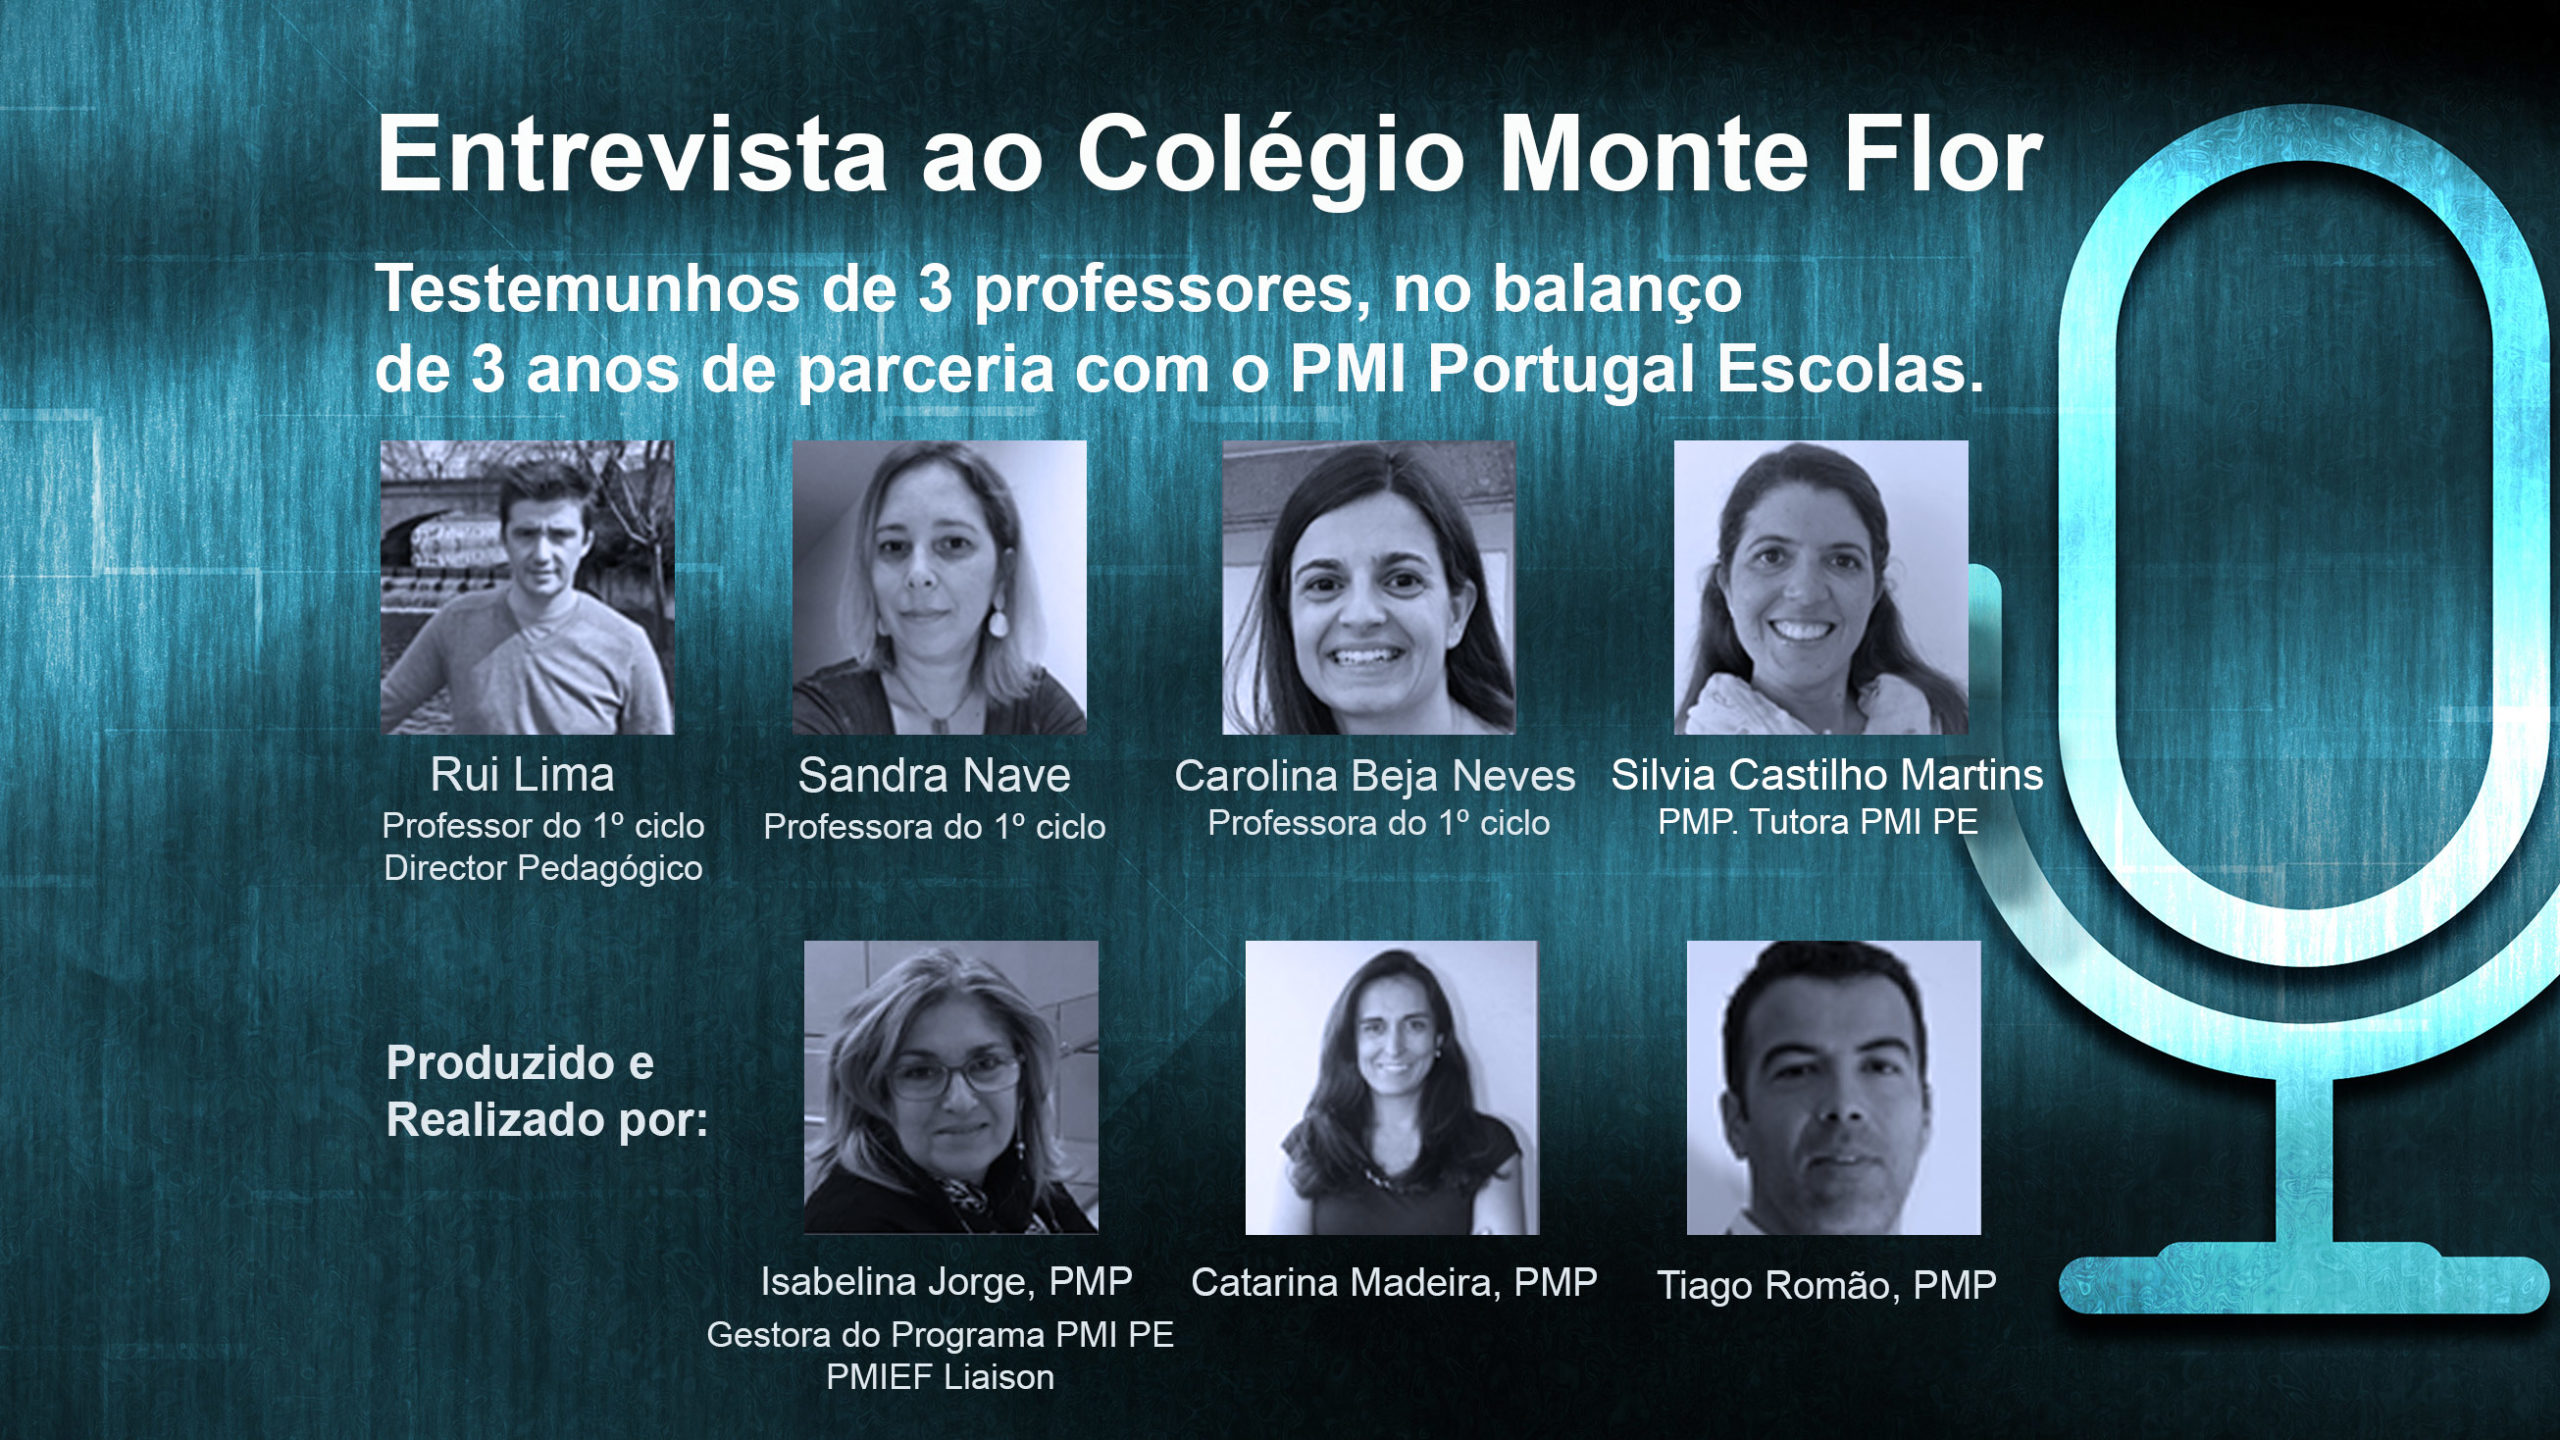 Entrevista ao Colégio Monte Flor